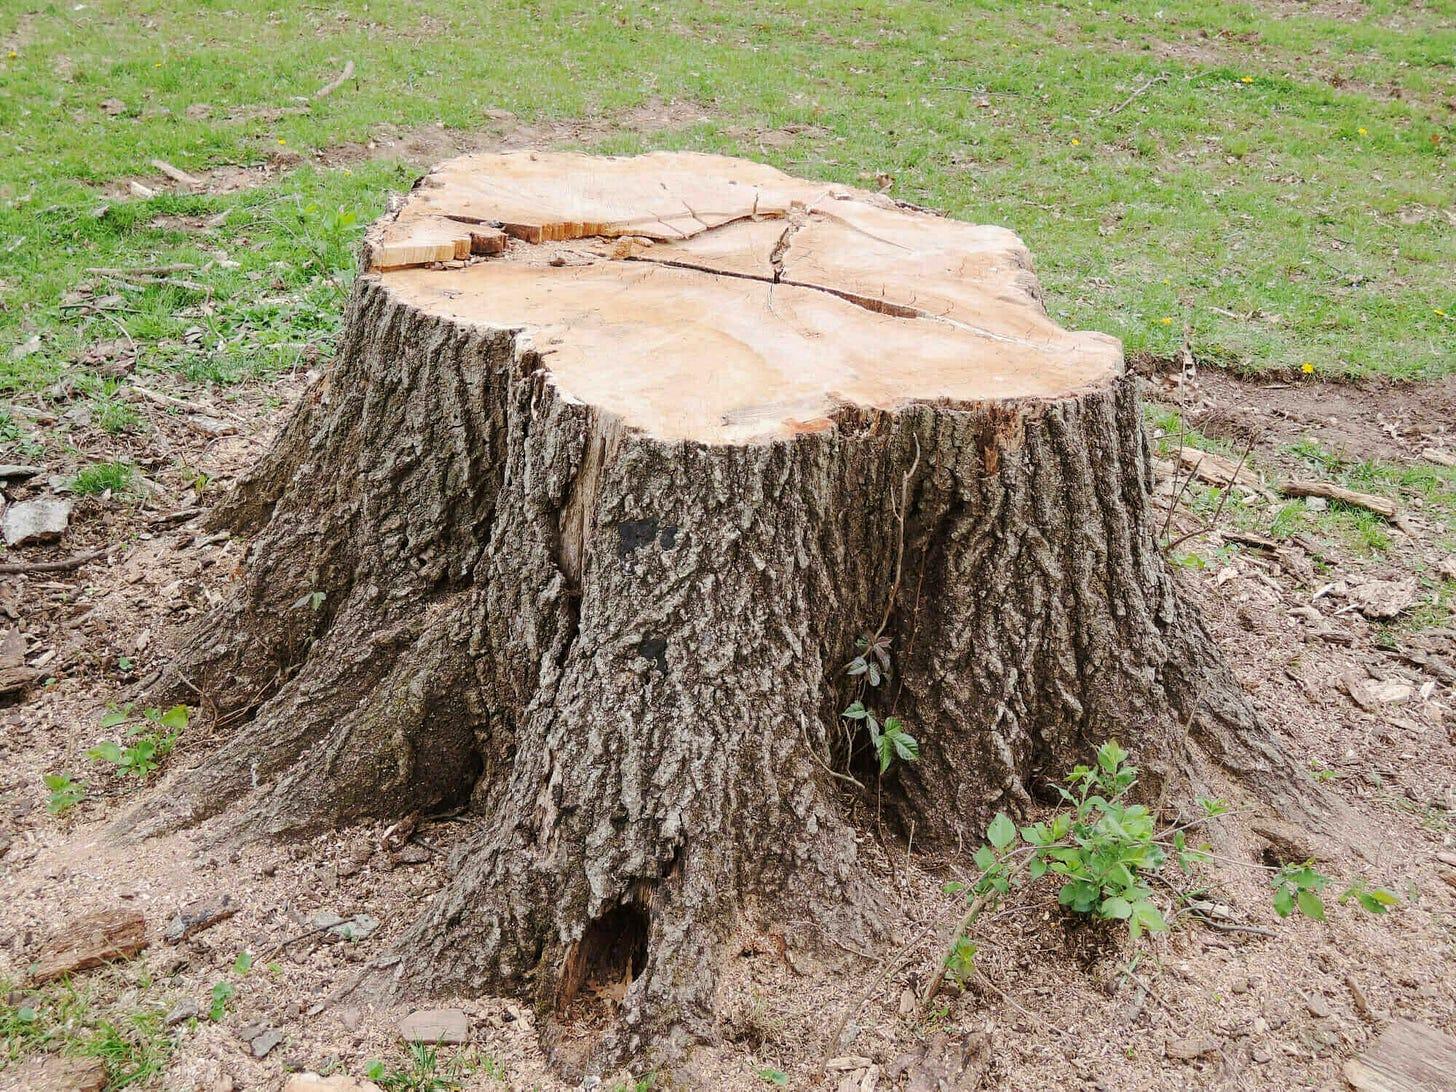 Tree Stump Removal Reasons | Reasons To Remove A Tree Stump